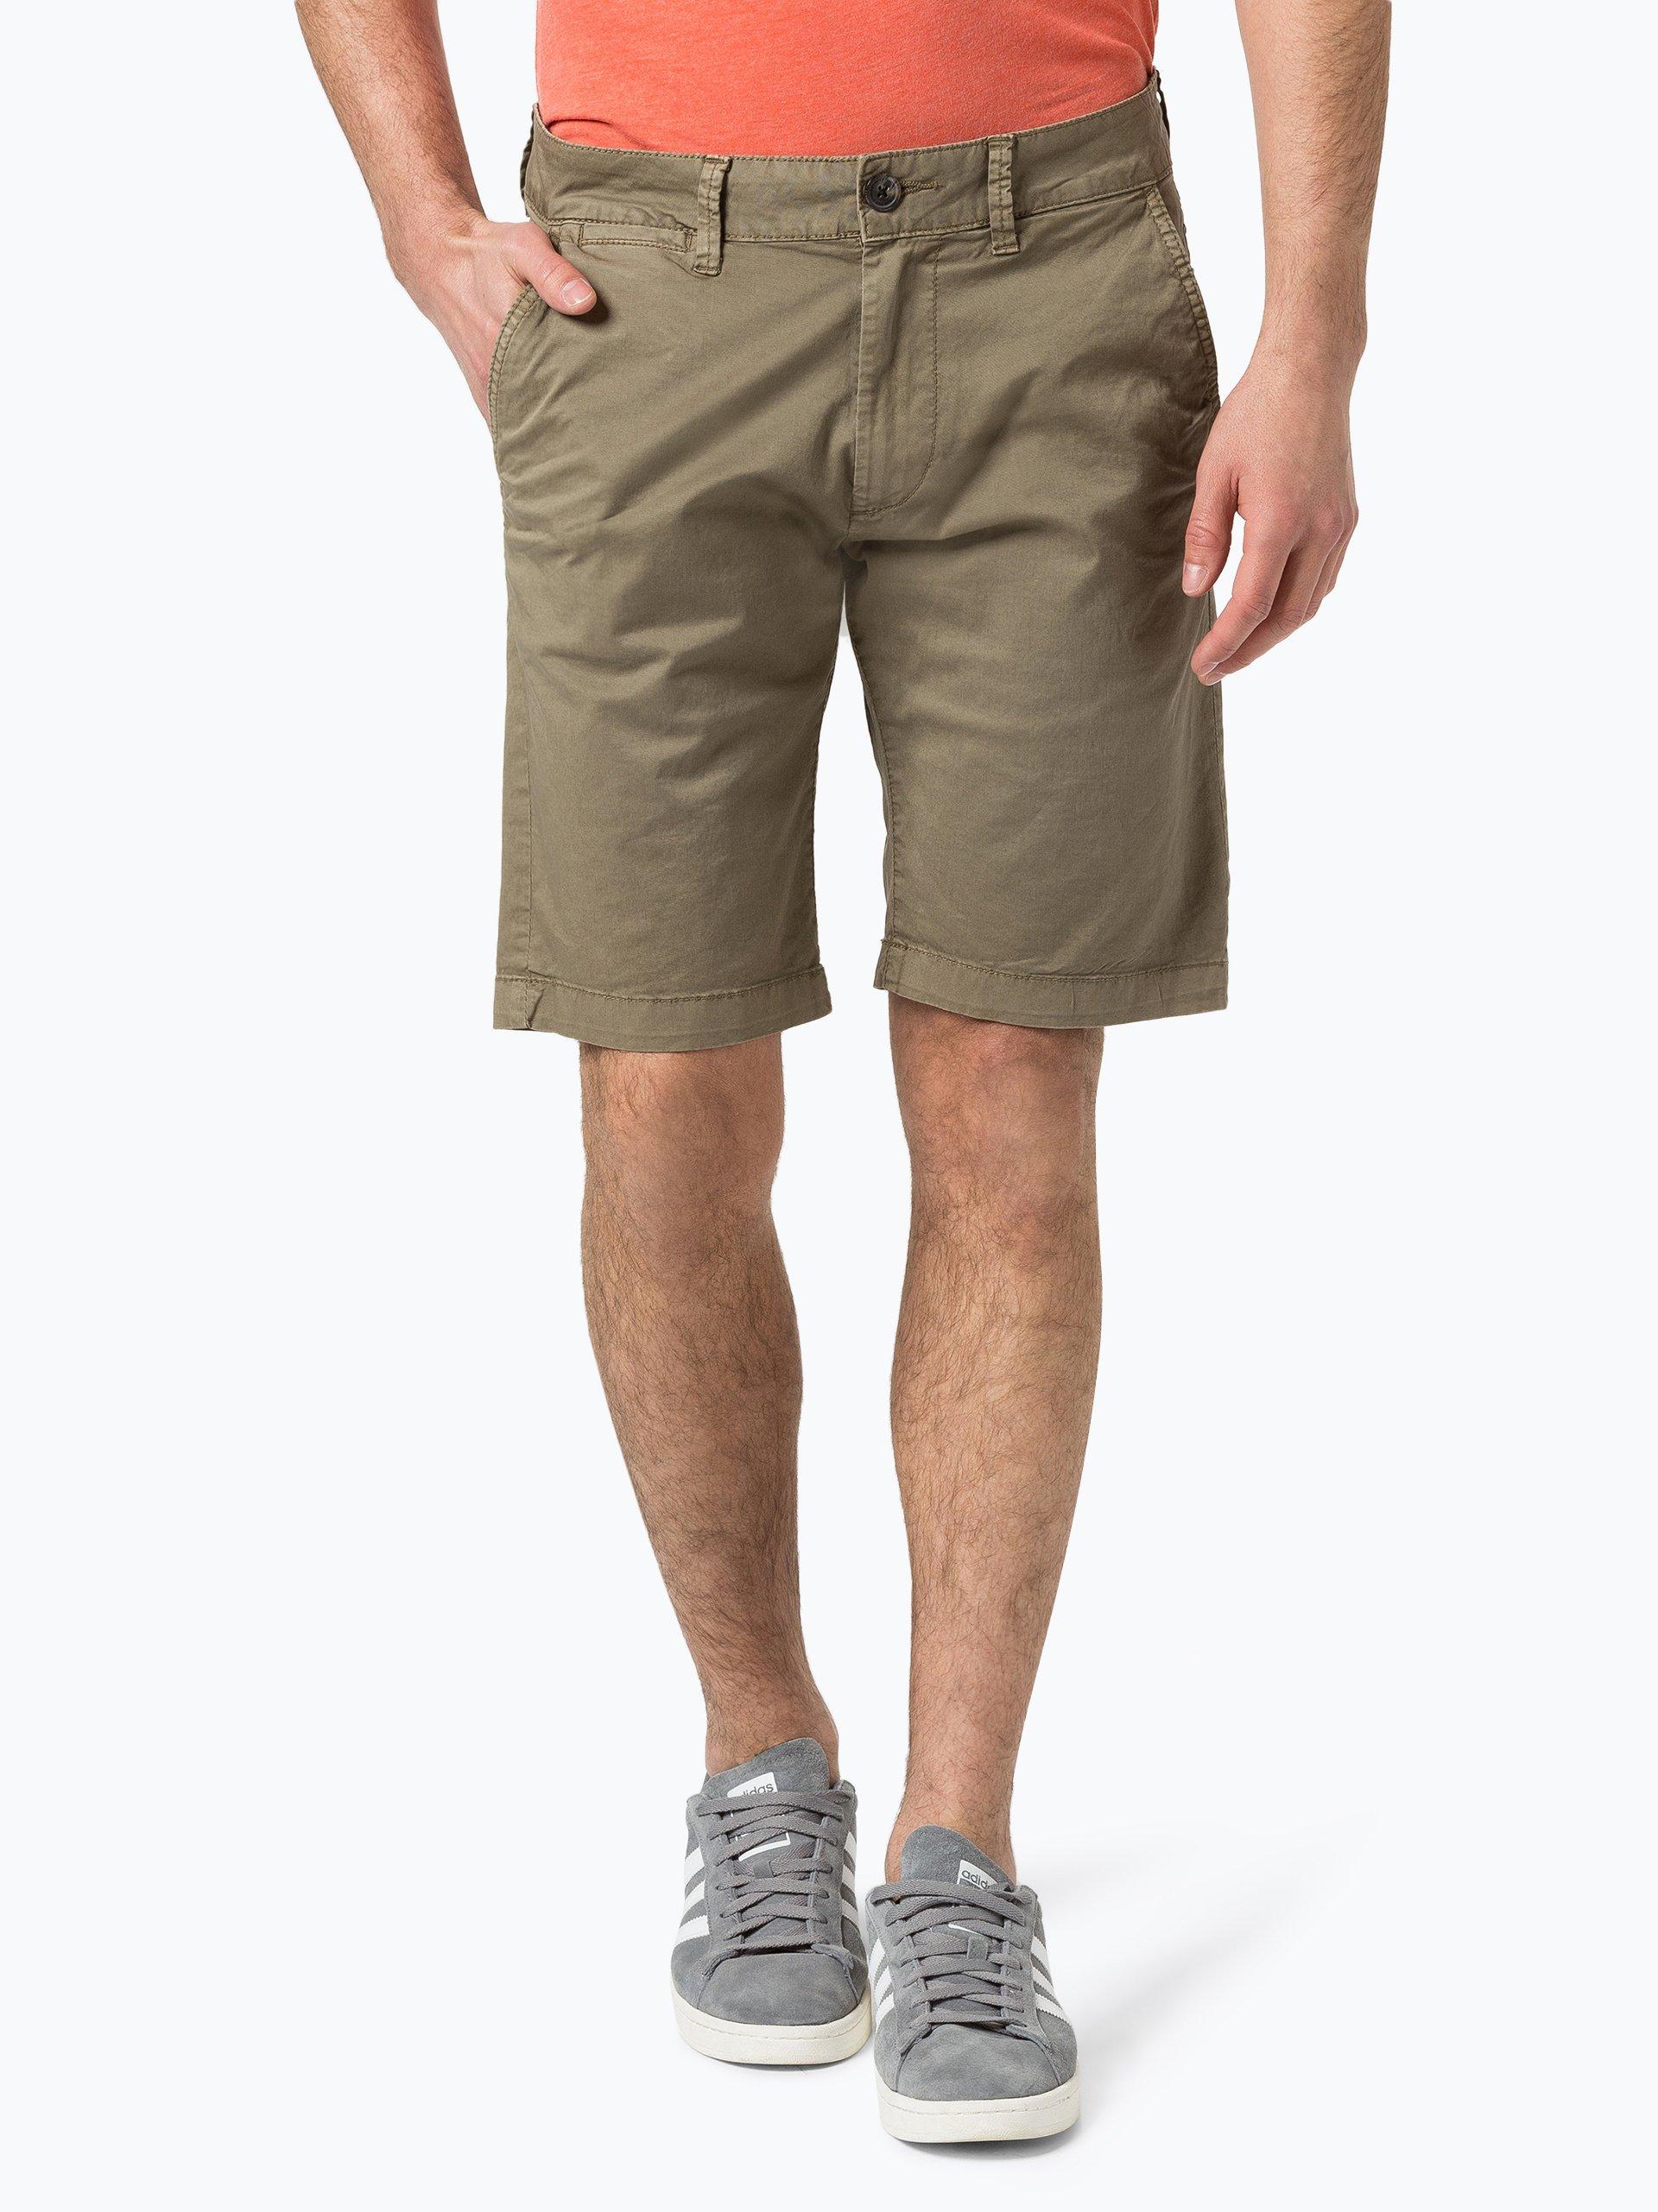 pepe jeans herren shorts mc queen oliv uni online kaufen peek und cloppenburg de. Black Bedroom Furniture Sets. Home Design Ideas